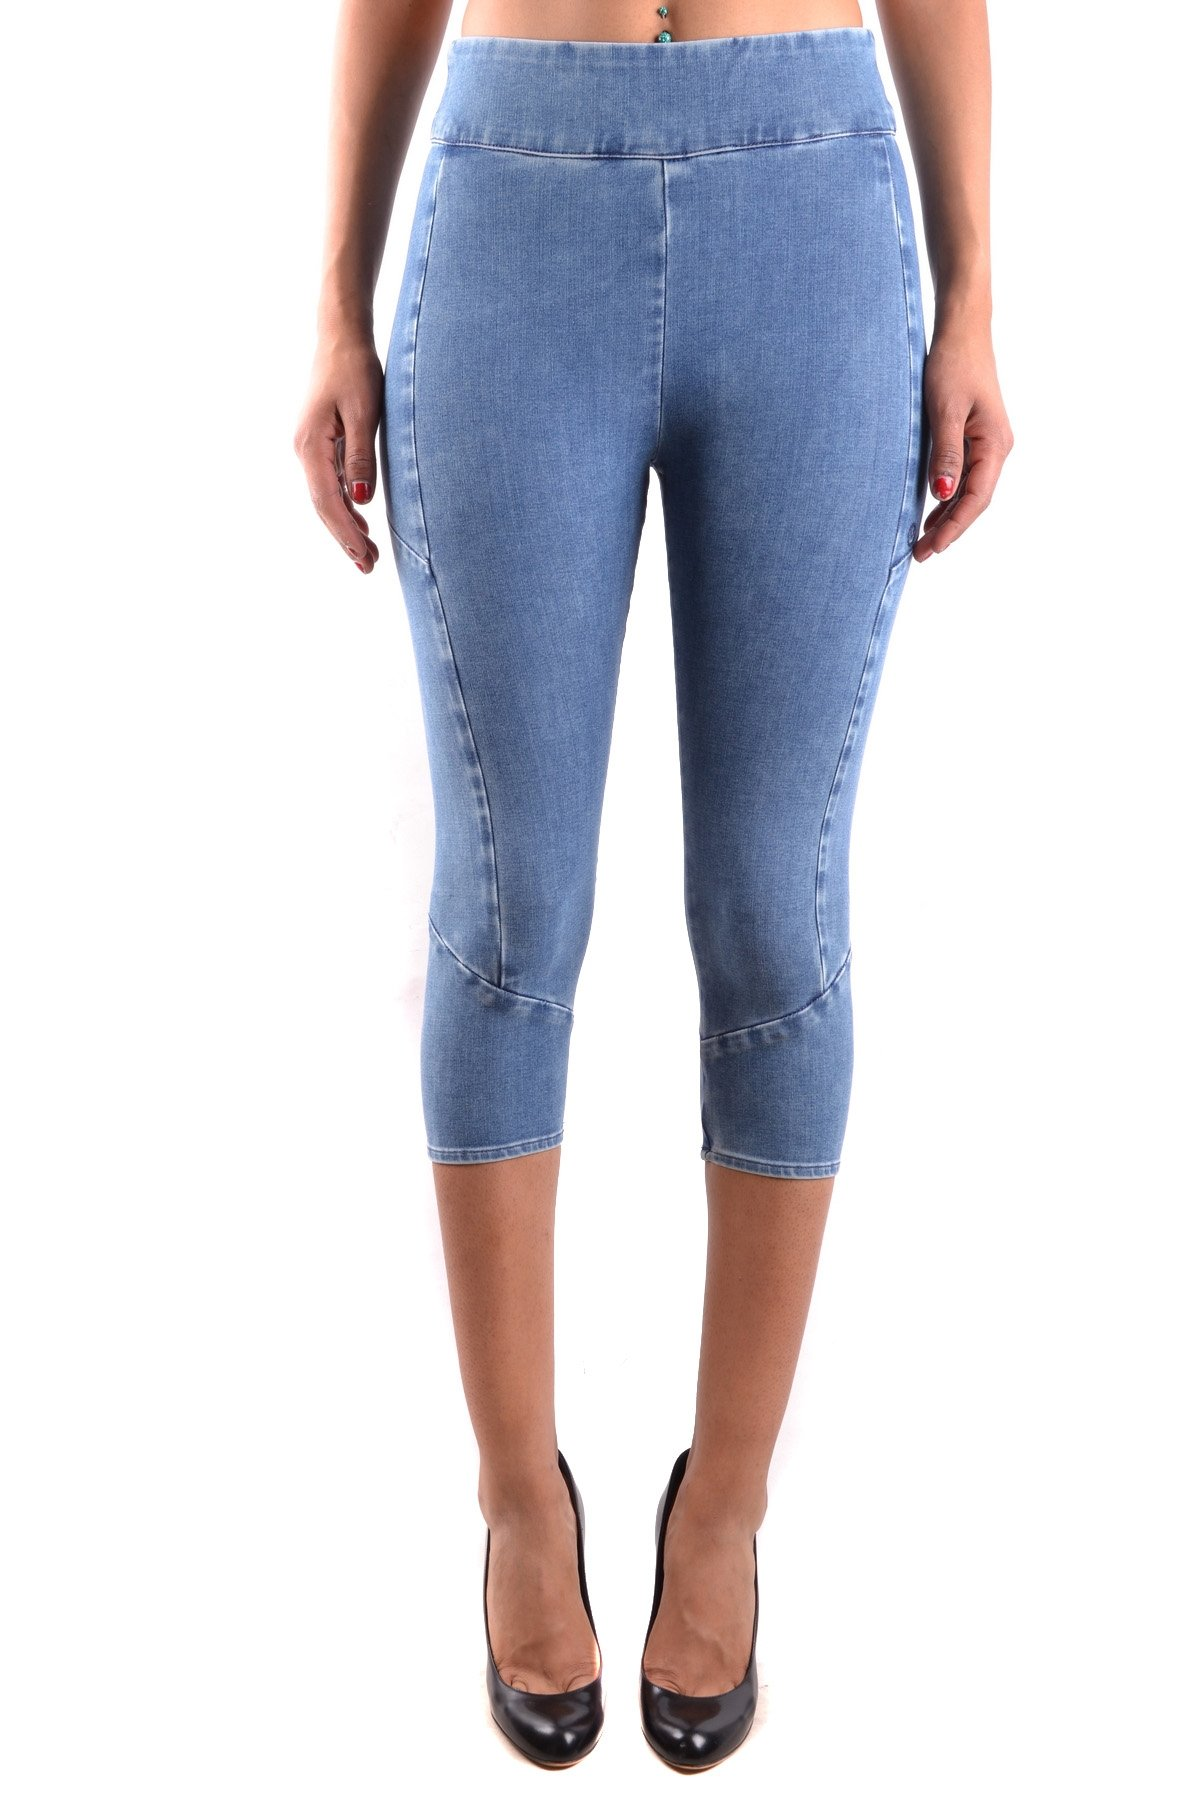 MELTIN'POT Women's Mcbi340073o Blue Cotton Leggings